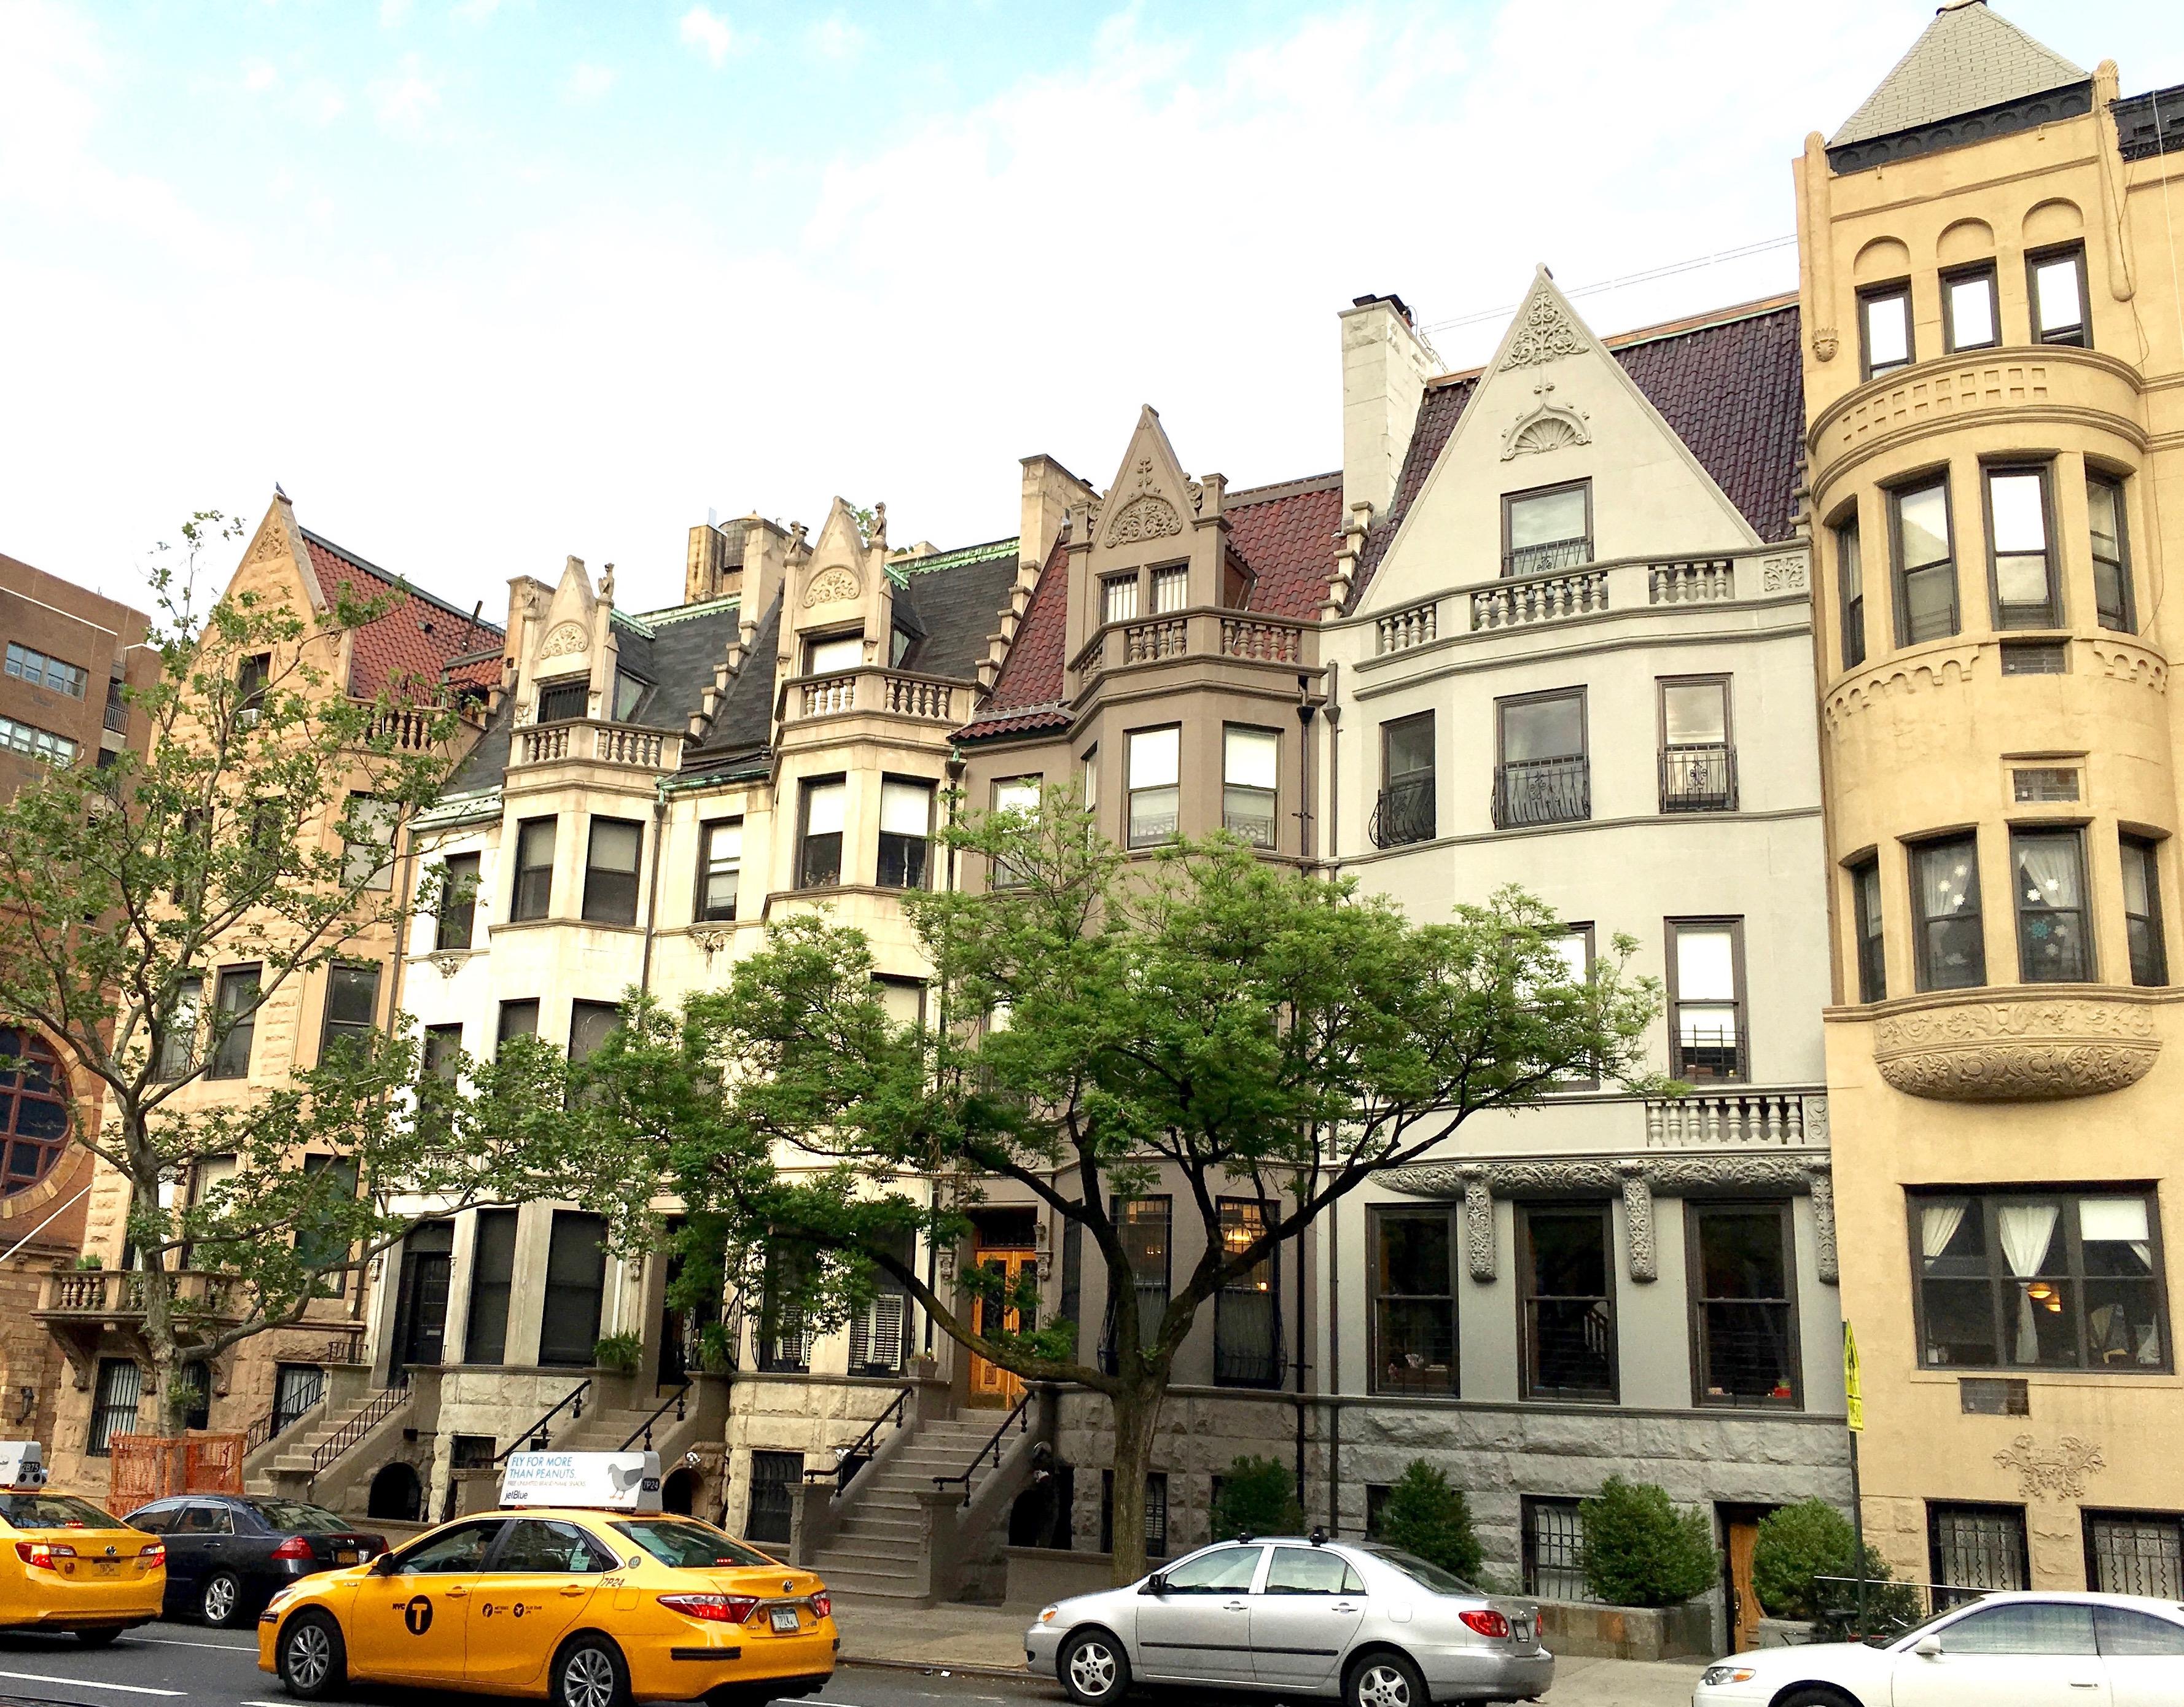 New York Row Houses : Queen anne row houses new york city ephemeral